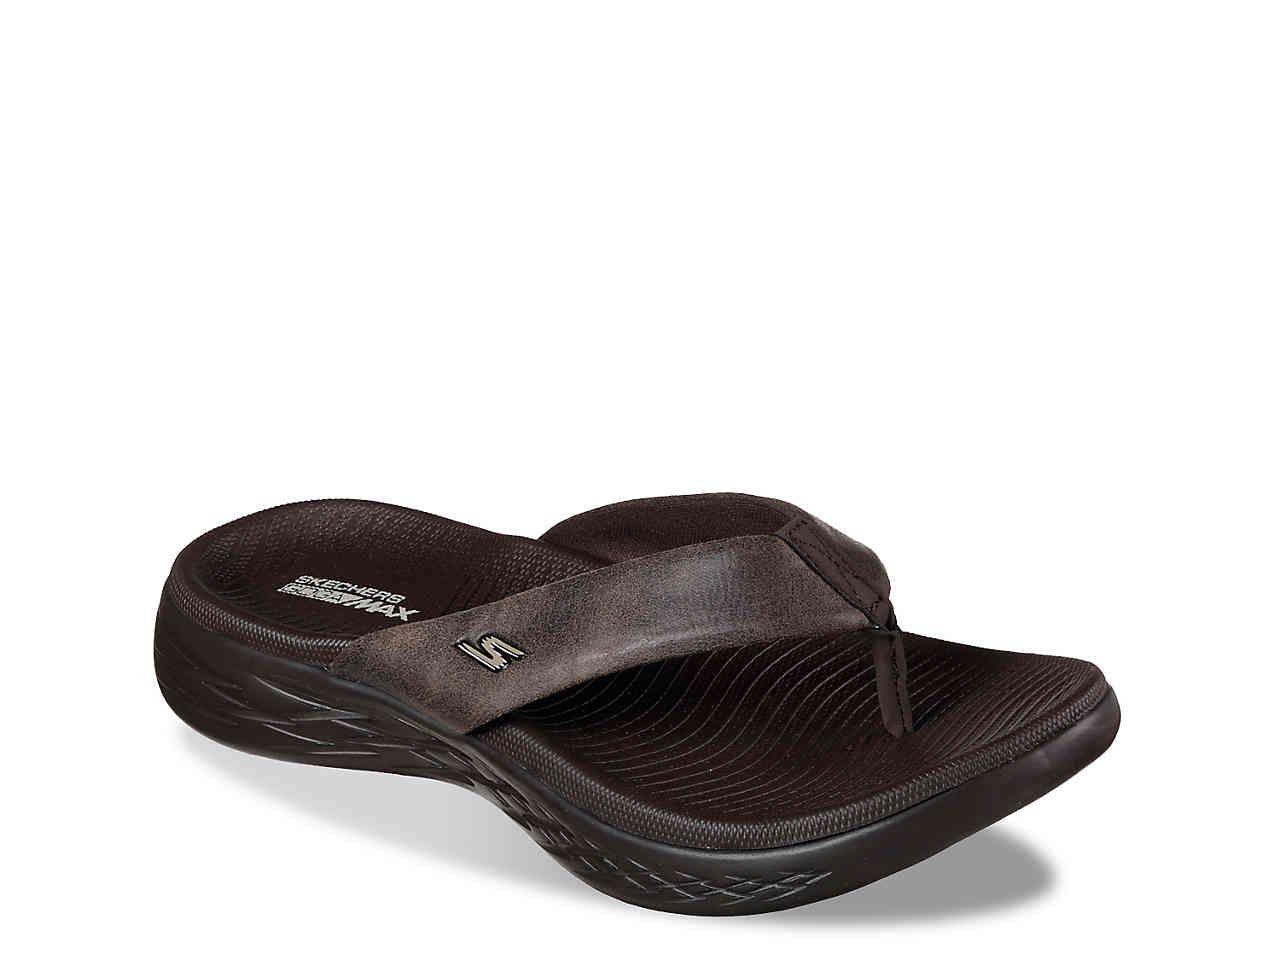 Skechers On The Go 600 Polished Flip Flop Women S Shoes Dsw